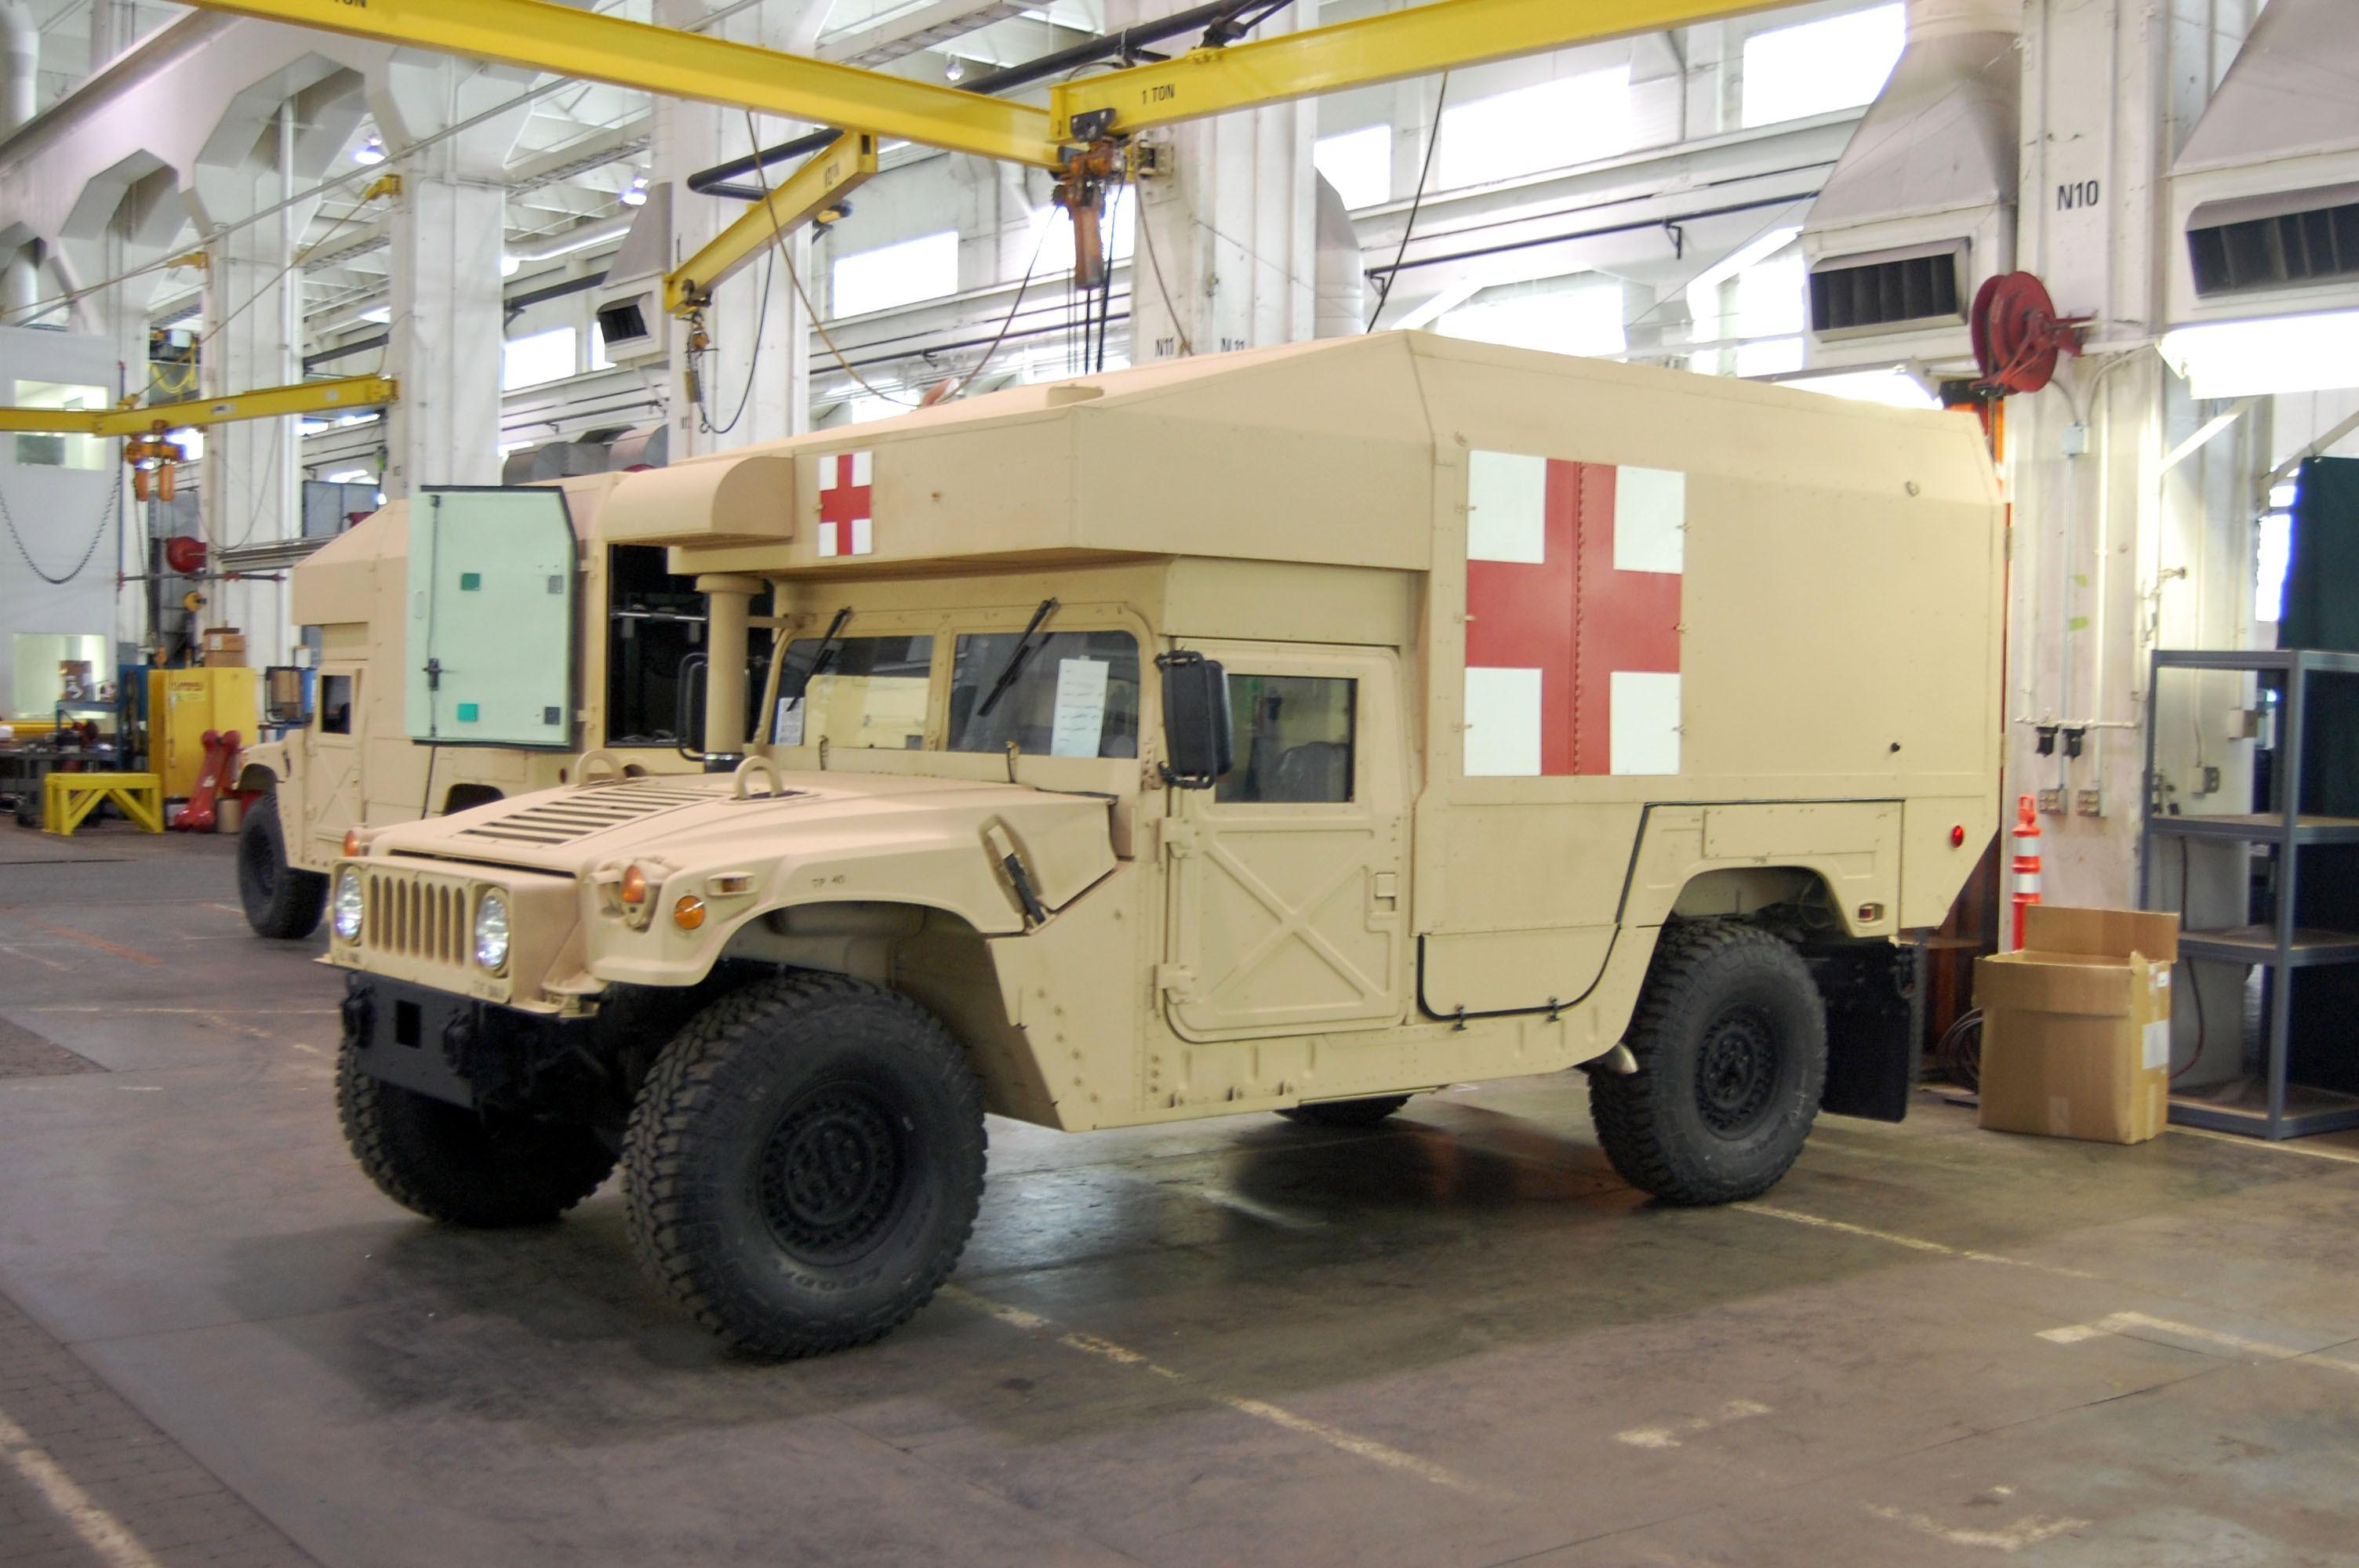 Rock Island Arsenal Jmtc Unveils New National Guard